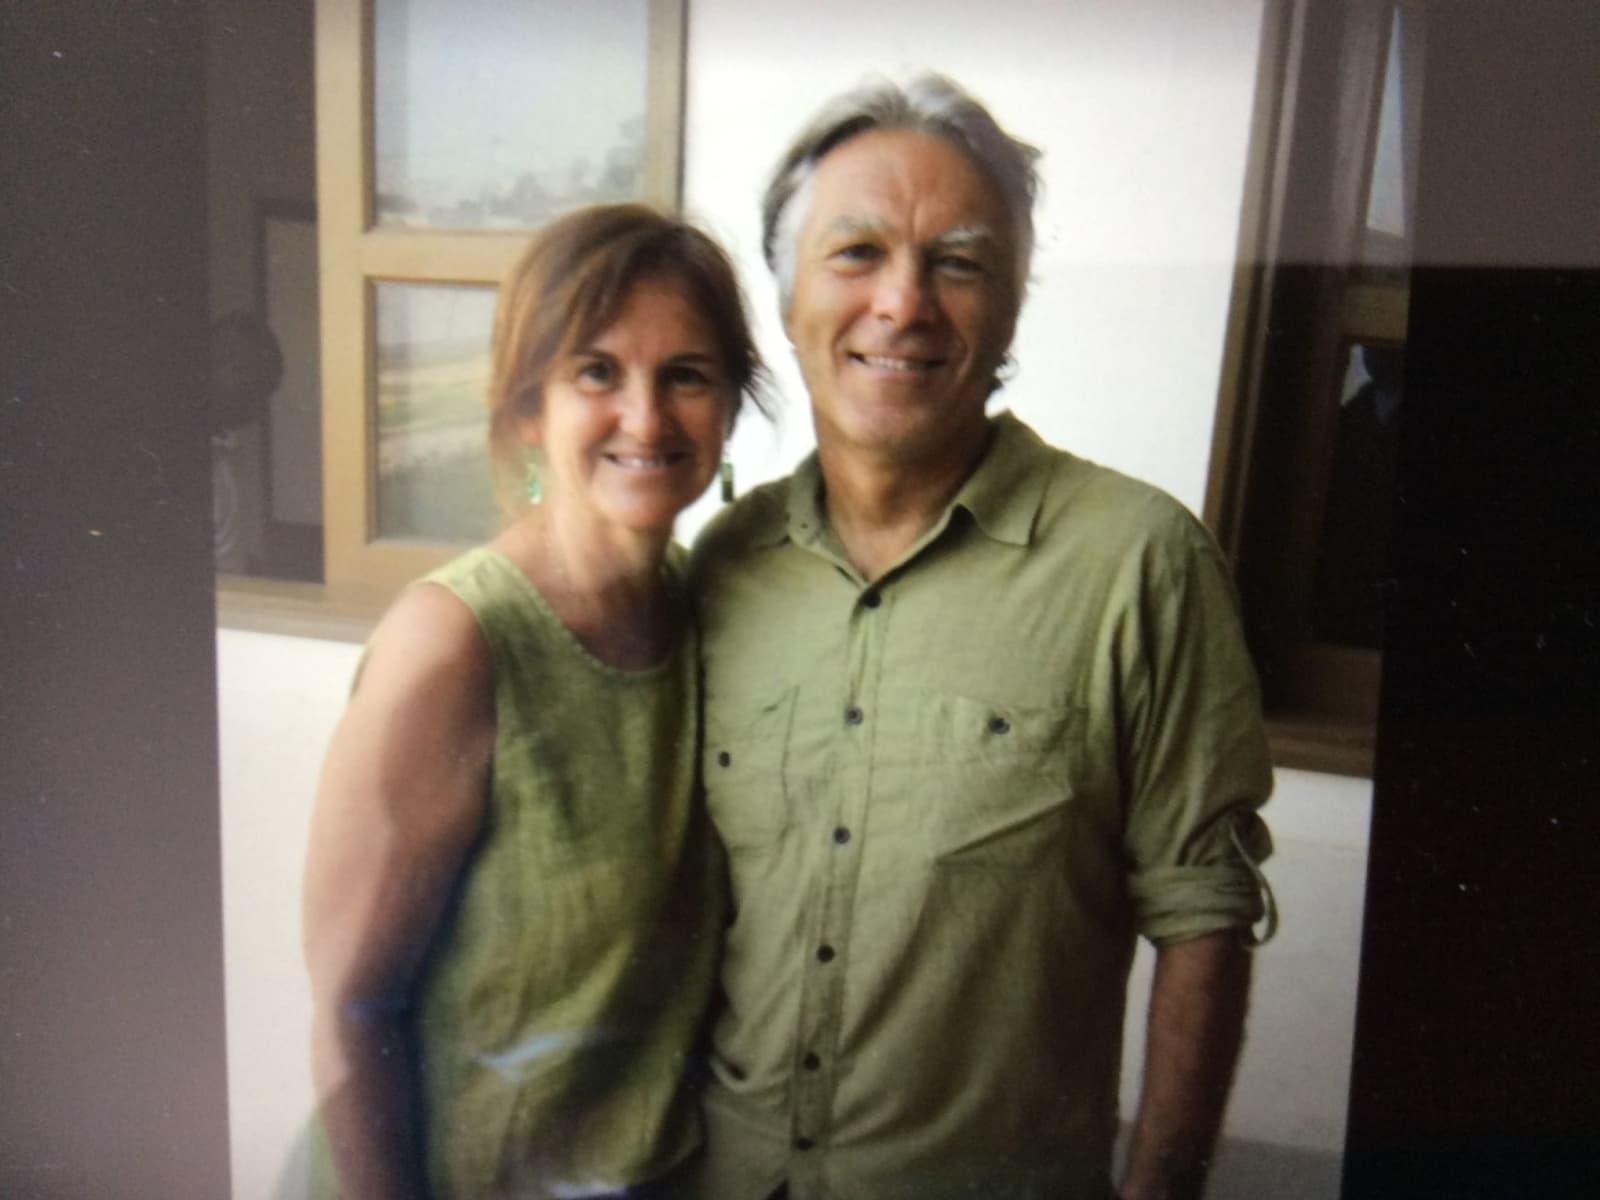 Phyllis & John from Montréal, Quebec, Canada